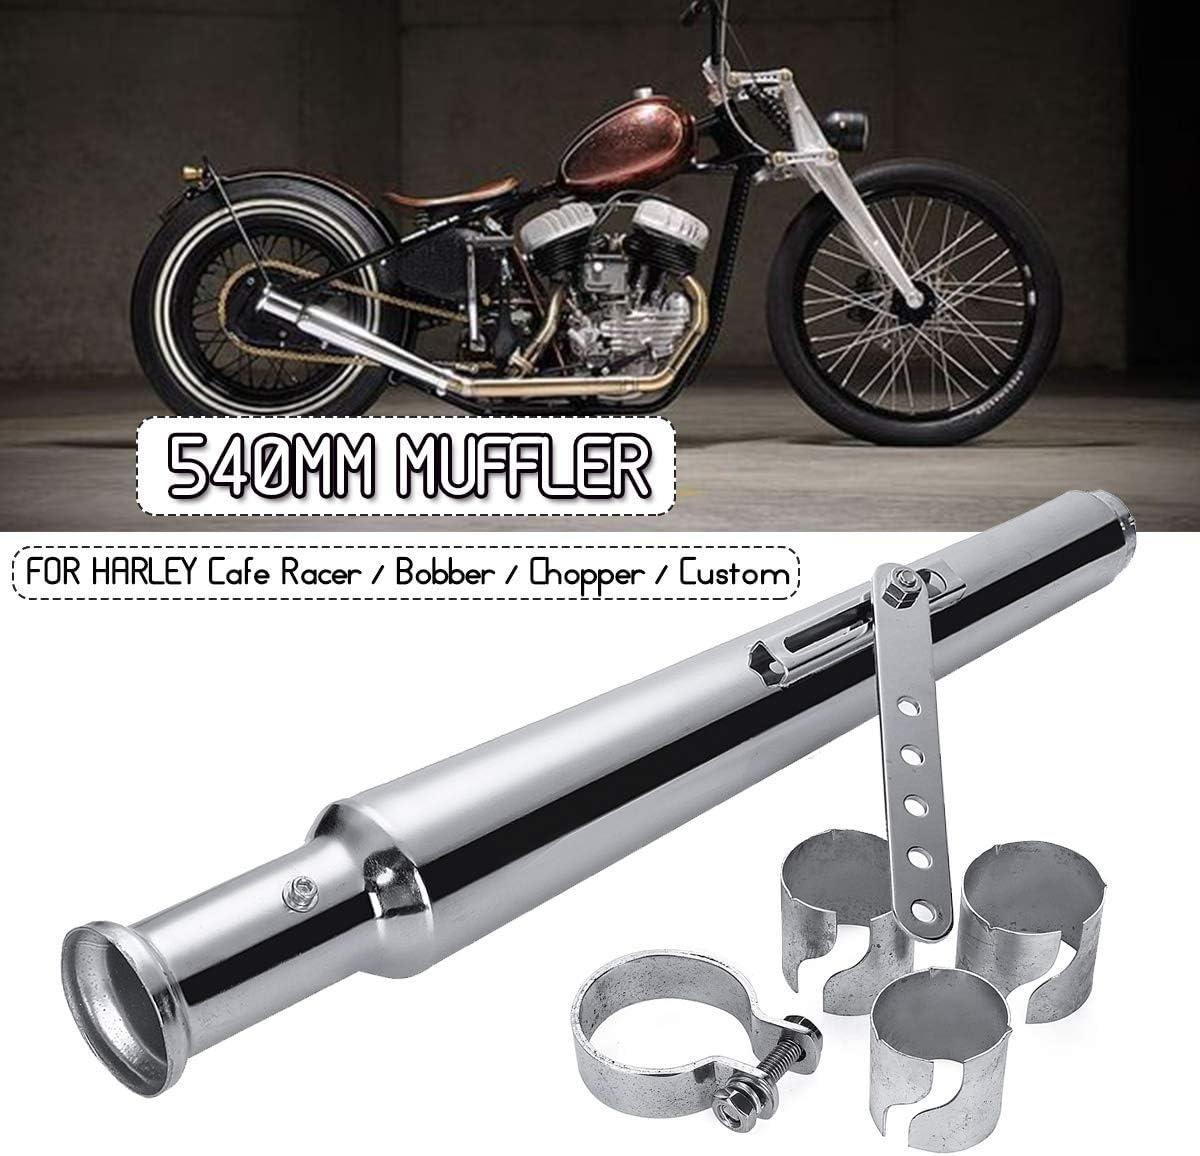 Powersports Teile 540mm Motorrad Retro Endstück Auspuff Schalldämpfer Schalldämpfer For Harley Cafe Racer For Bobber For Chopper For Custom Auto